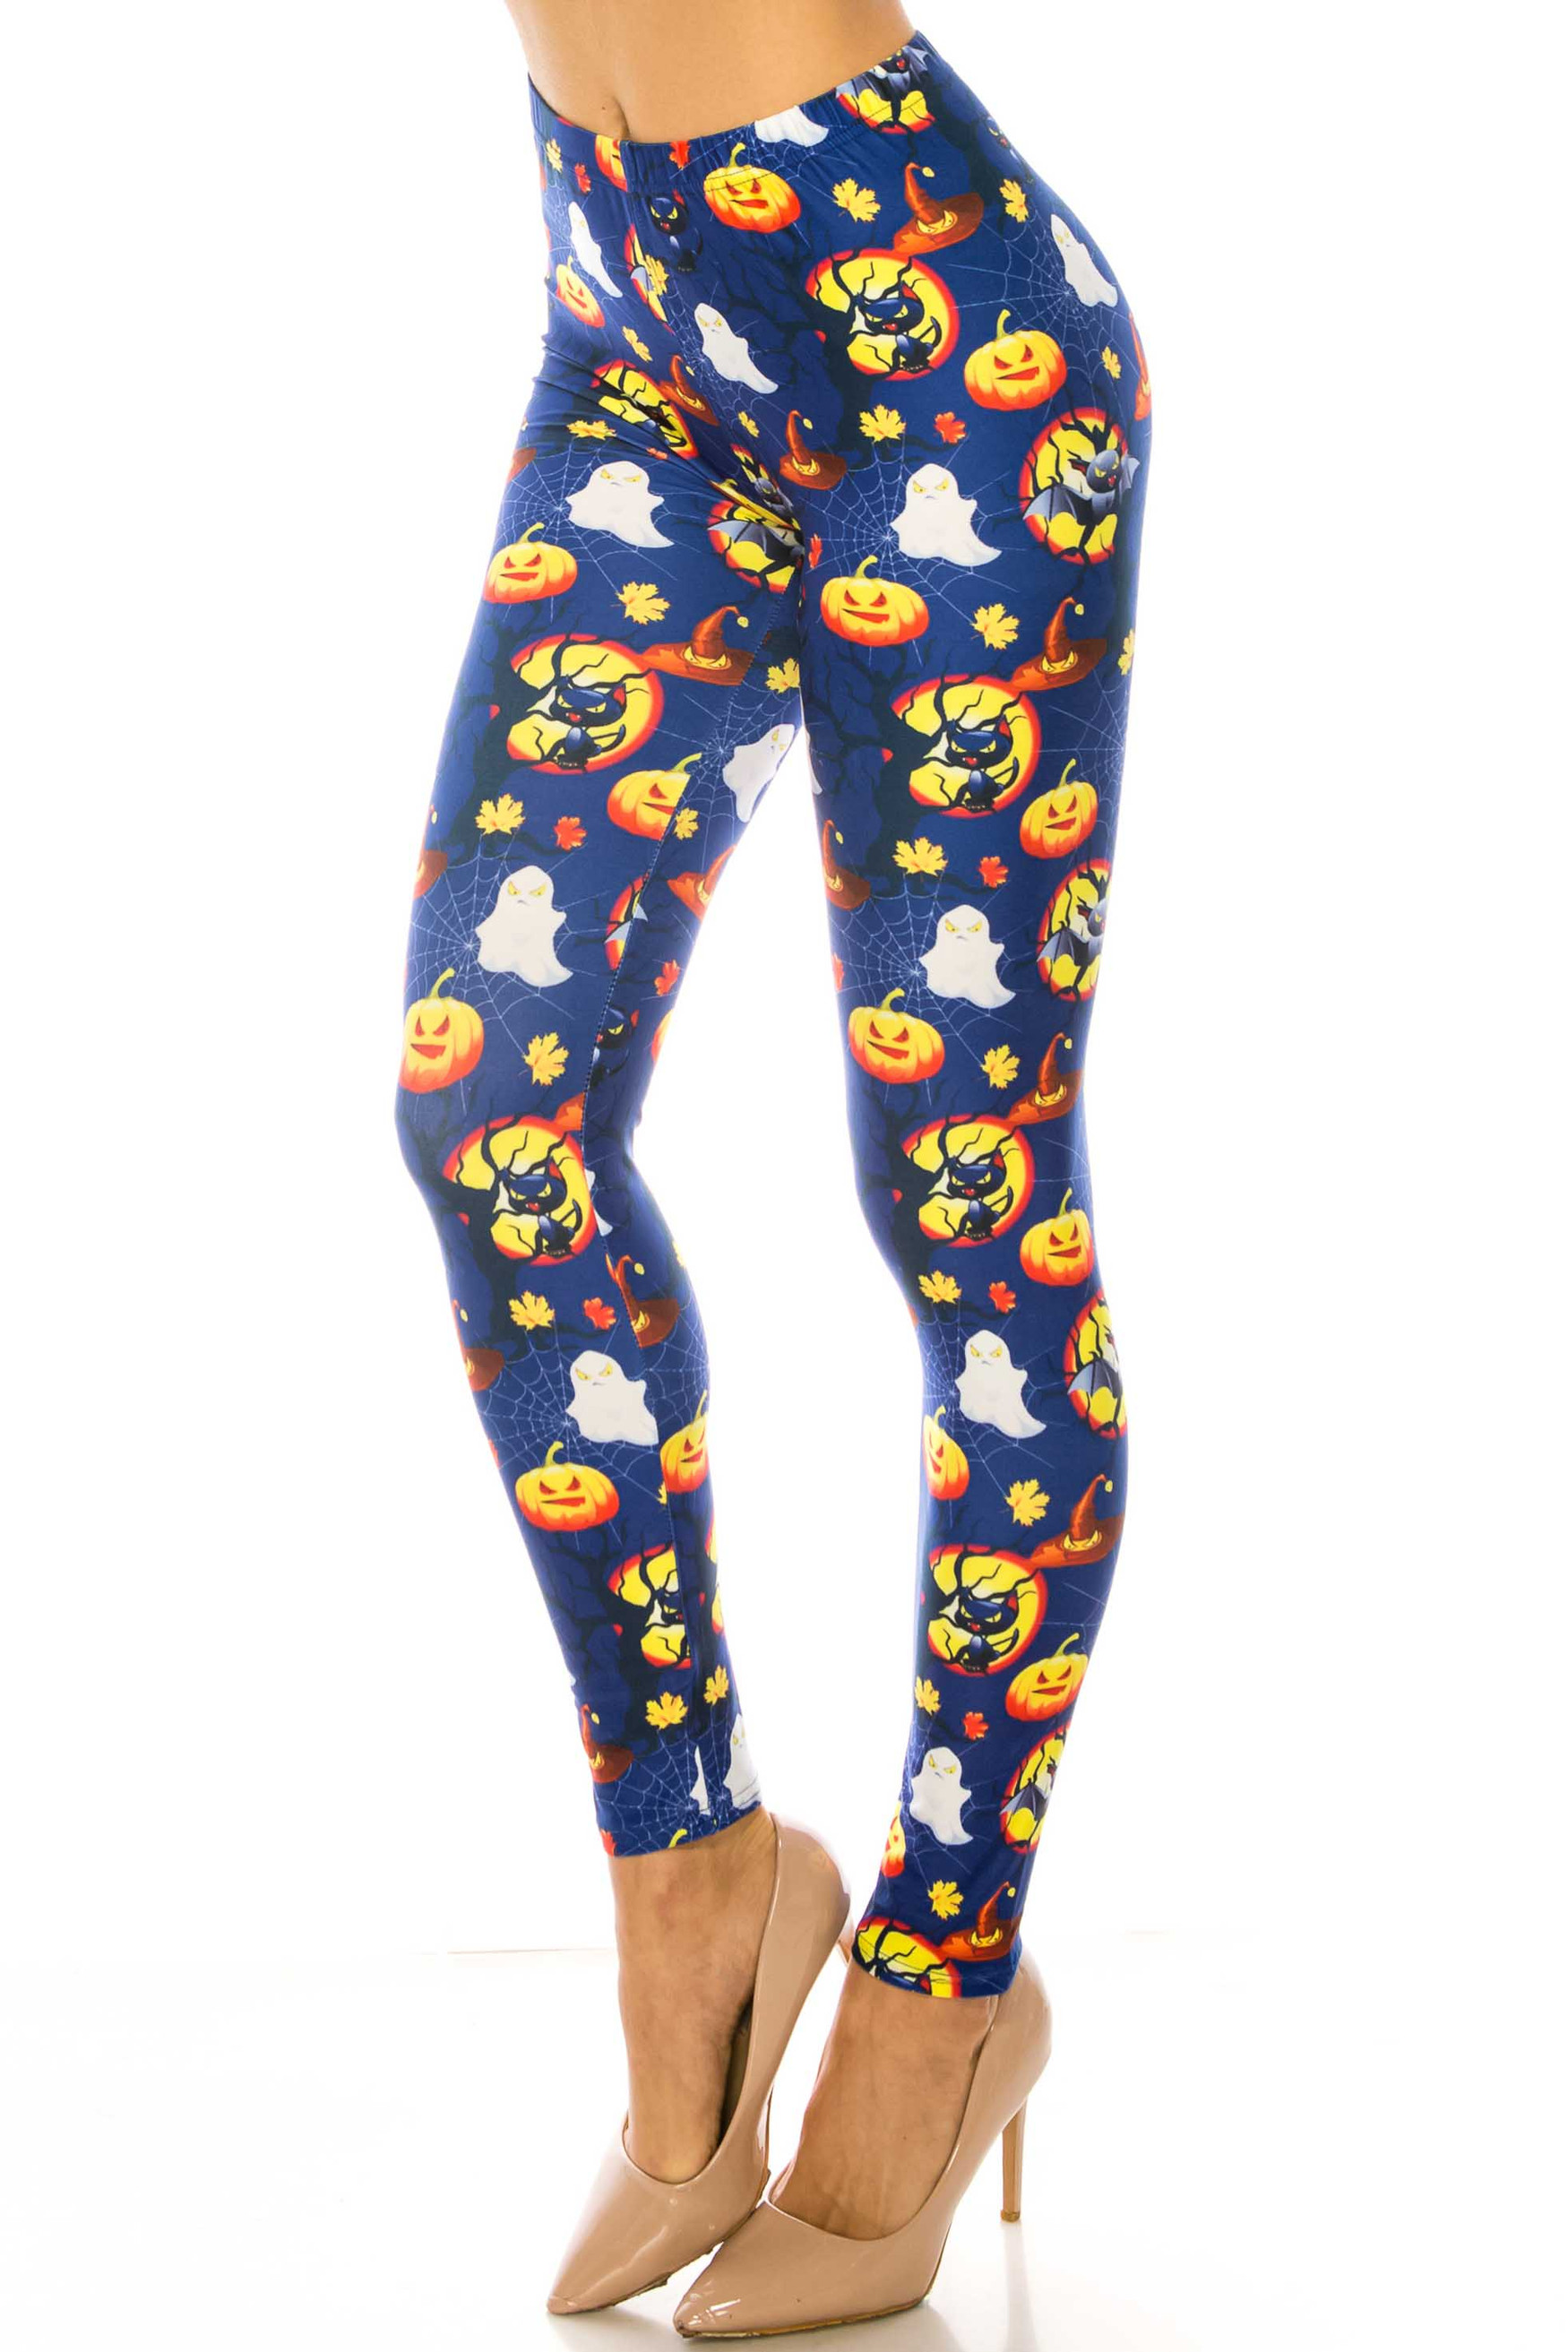 Wholesale Creamy Soft Halloween Critters Extra Plus Size Leggings - 3X-5X - USA Fashion™